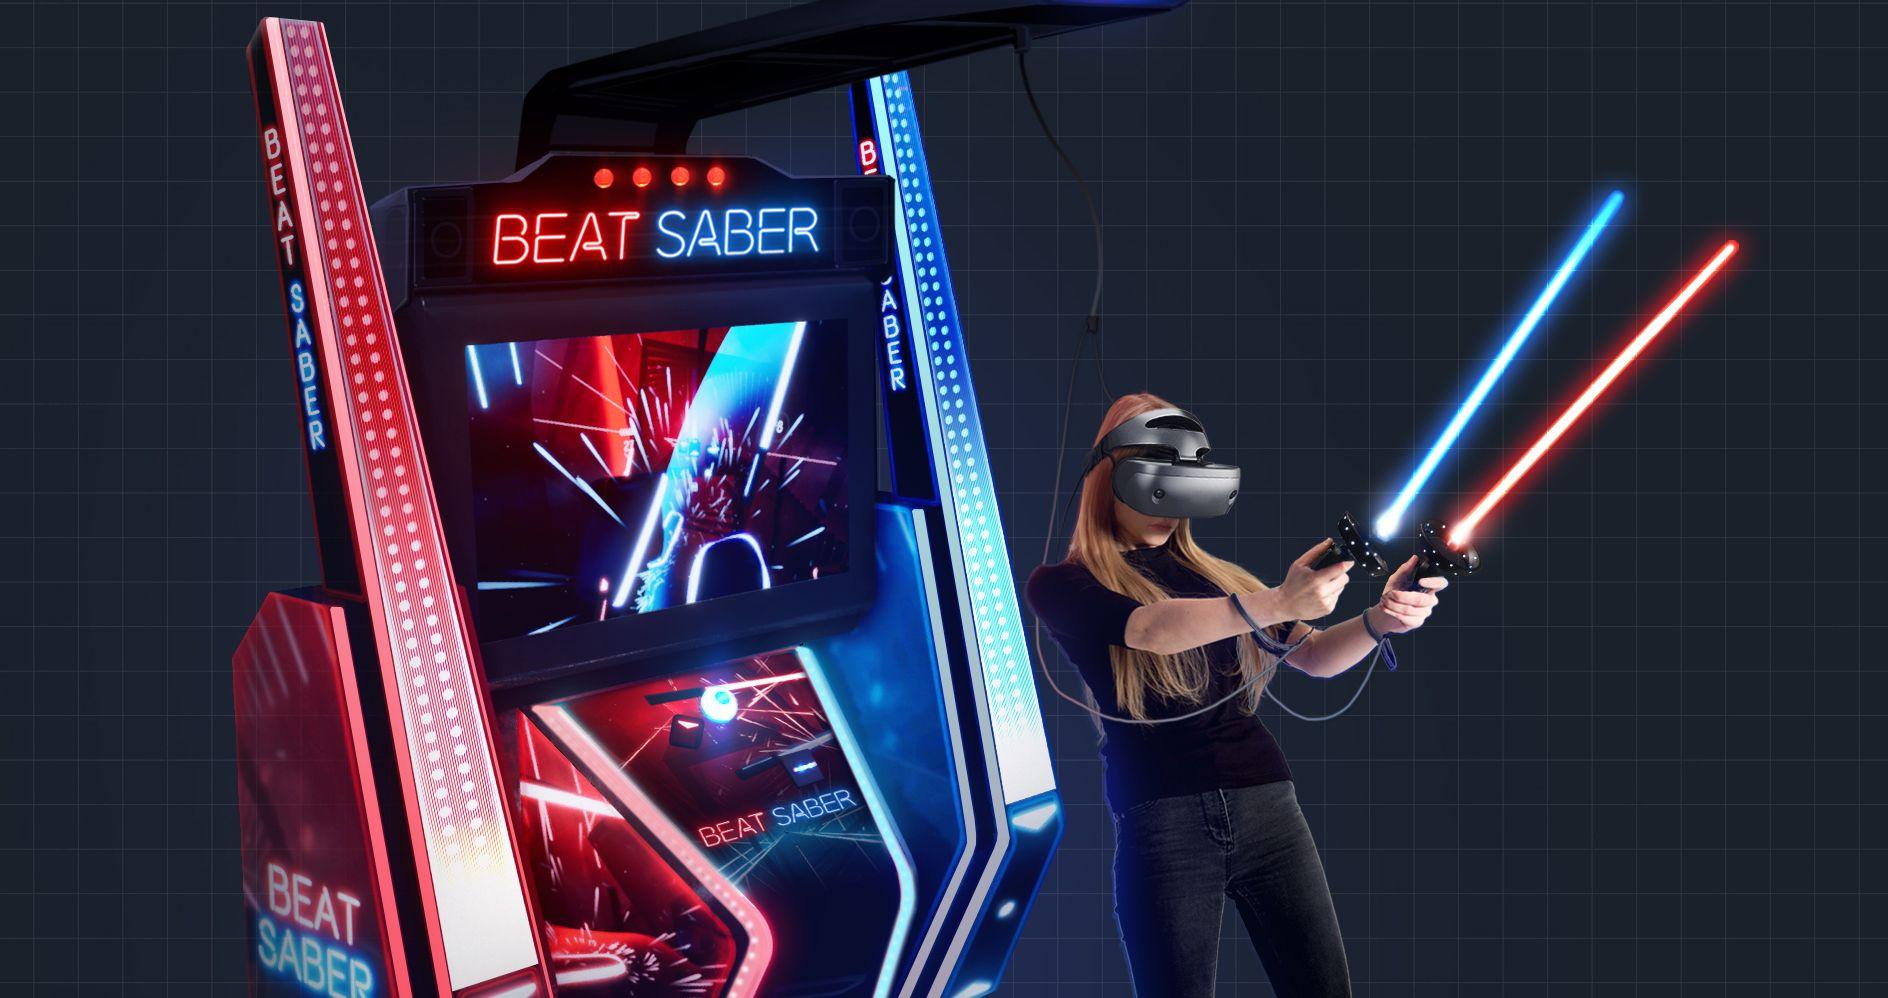 Beat Saber is officially bringing VR's killer app to arcades | Shacknews